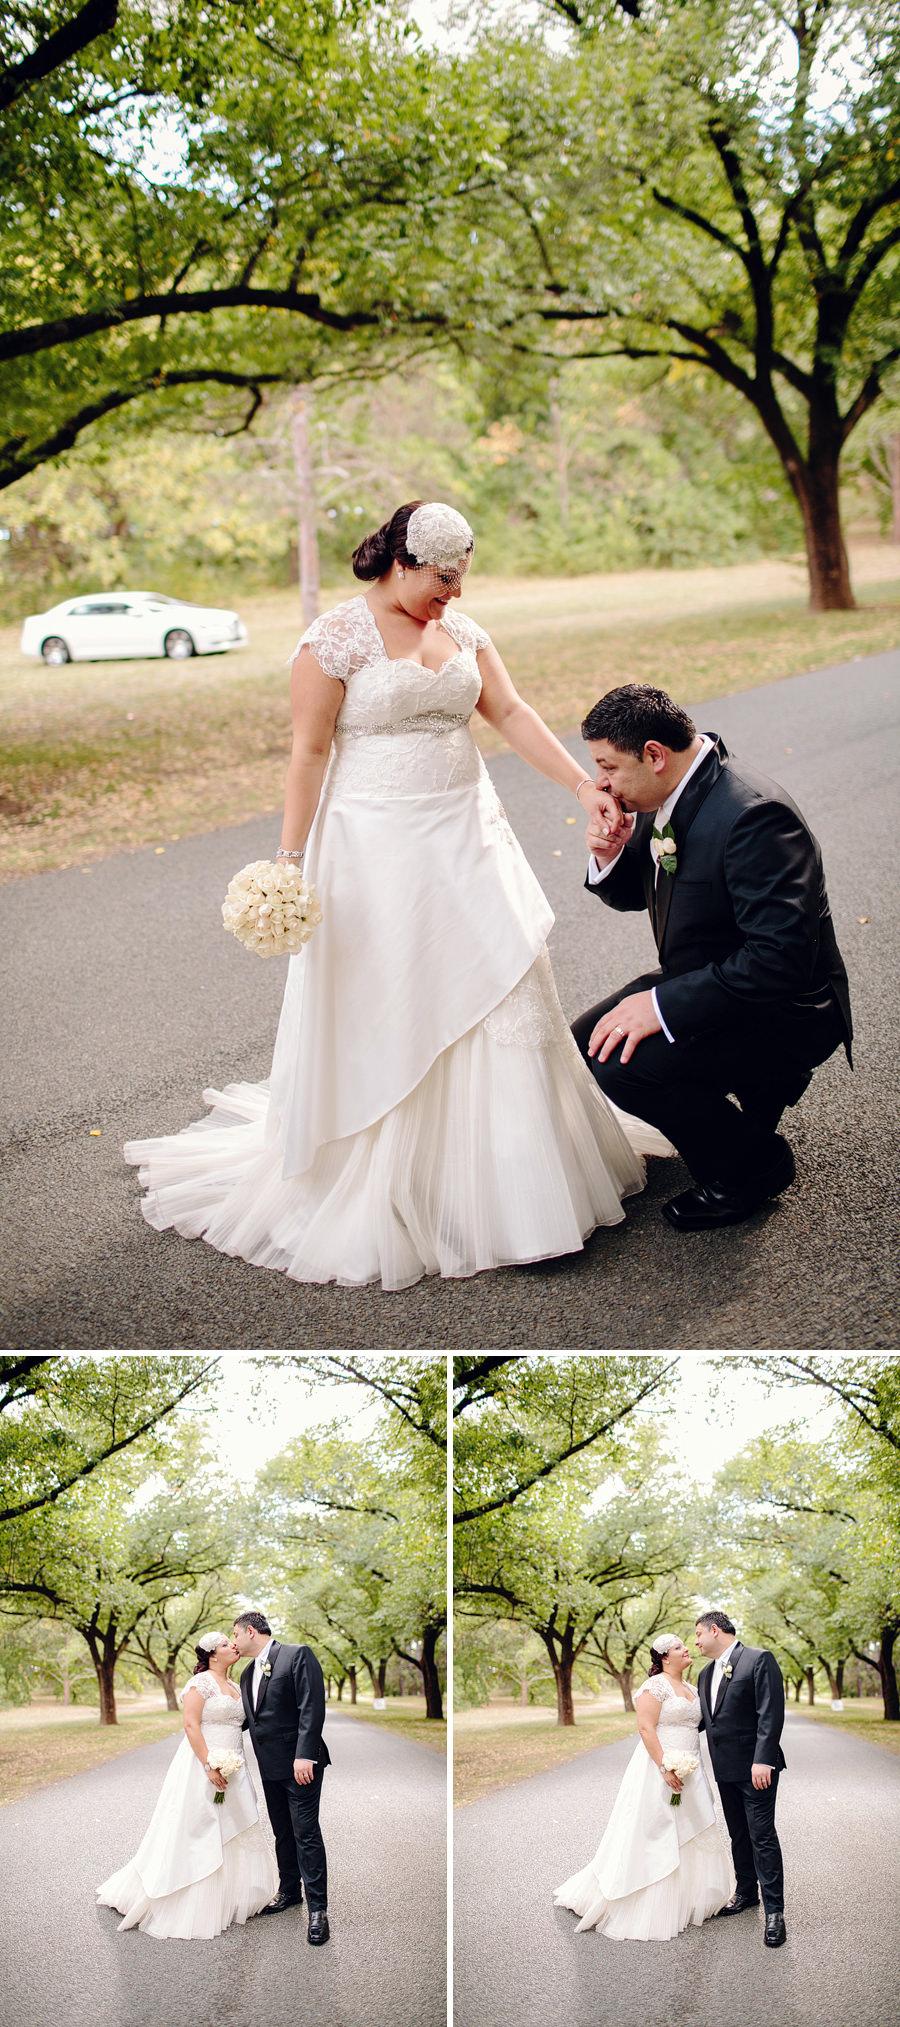 Timeless Wedding Photographer: Couple portraits